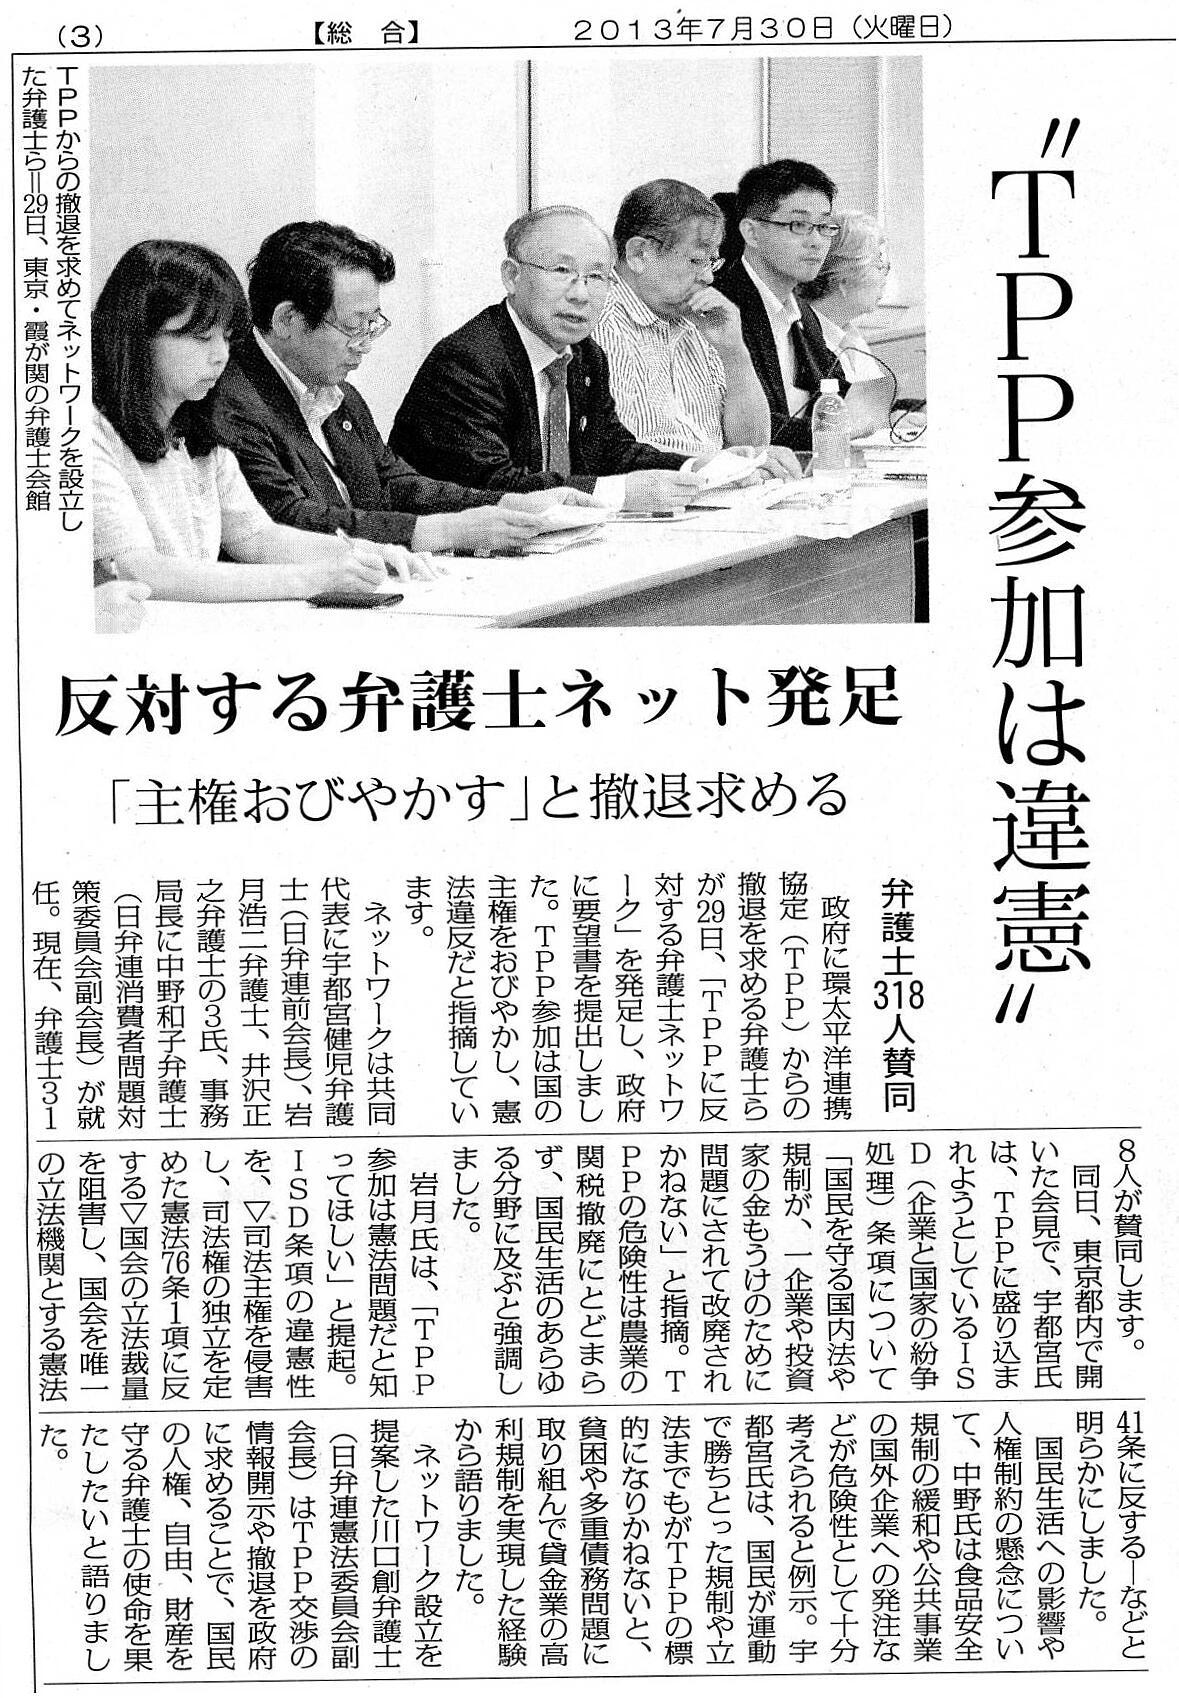 TPP 弁護士会